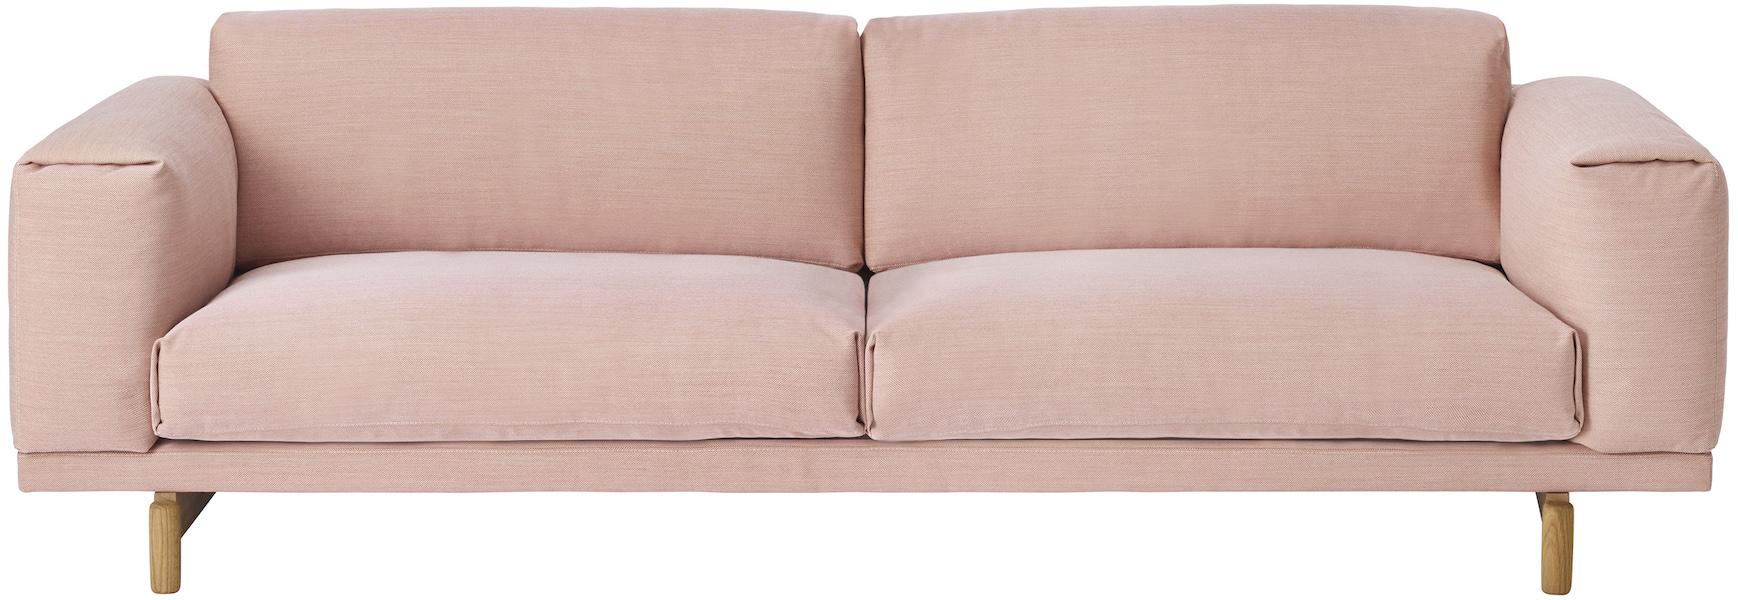 Pleasant Muuto Rest Design By Anderssen Voll Home Remodeling Inspirations Cosmcuboardxyz